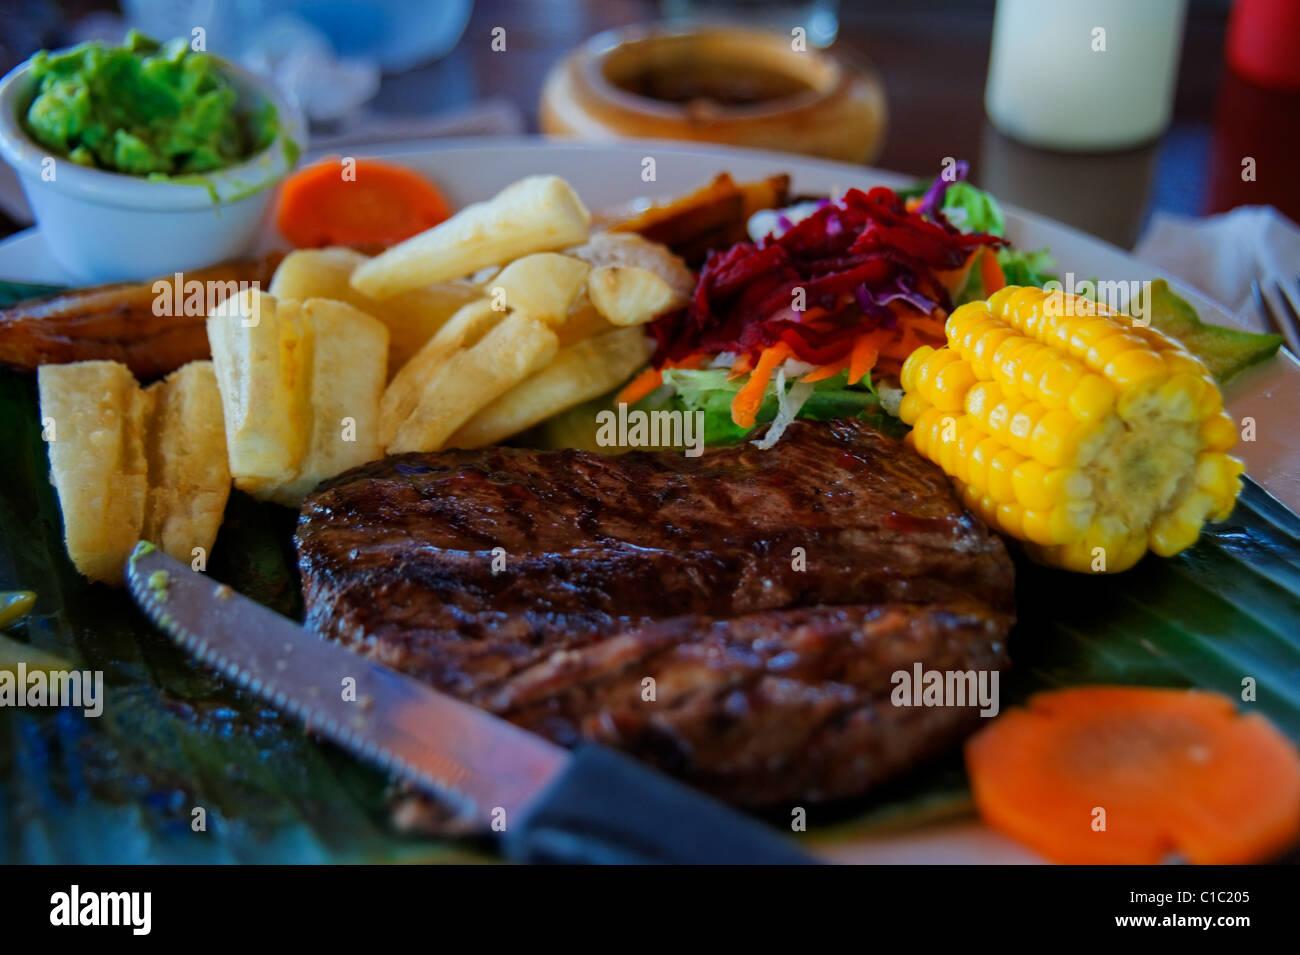 Steak and Yucca, Liberia near Airport, Guanacaste, Republic of Costa Rica, Central America - Stock Image